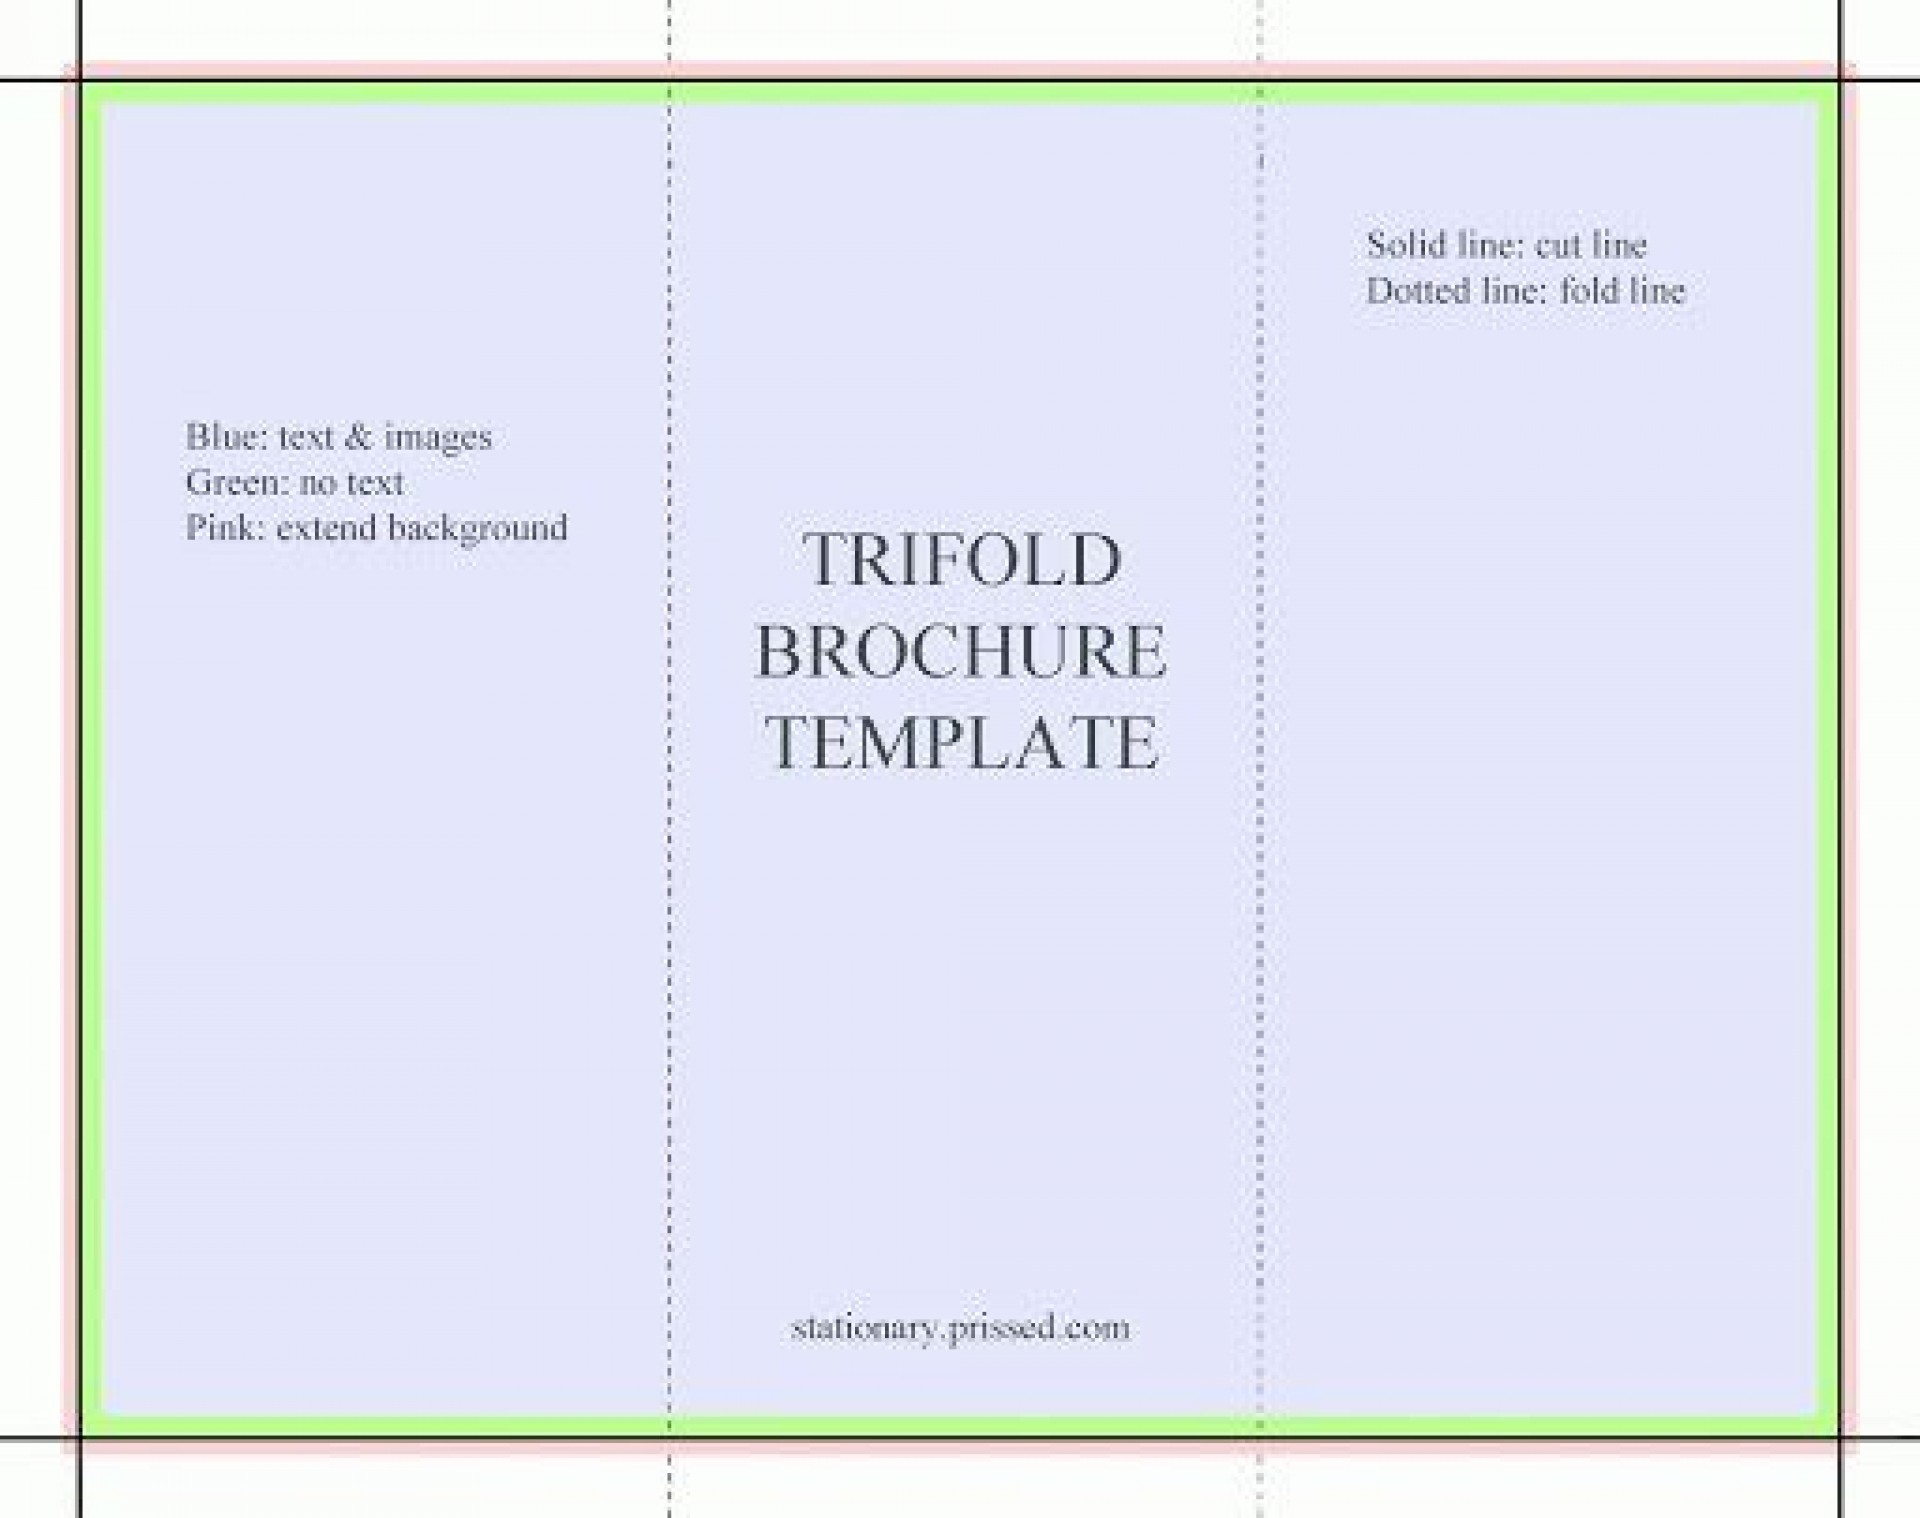 009 Incredible Brochure Template Google Drive Example  Free1920